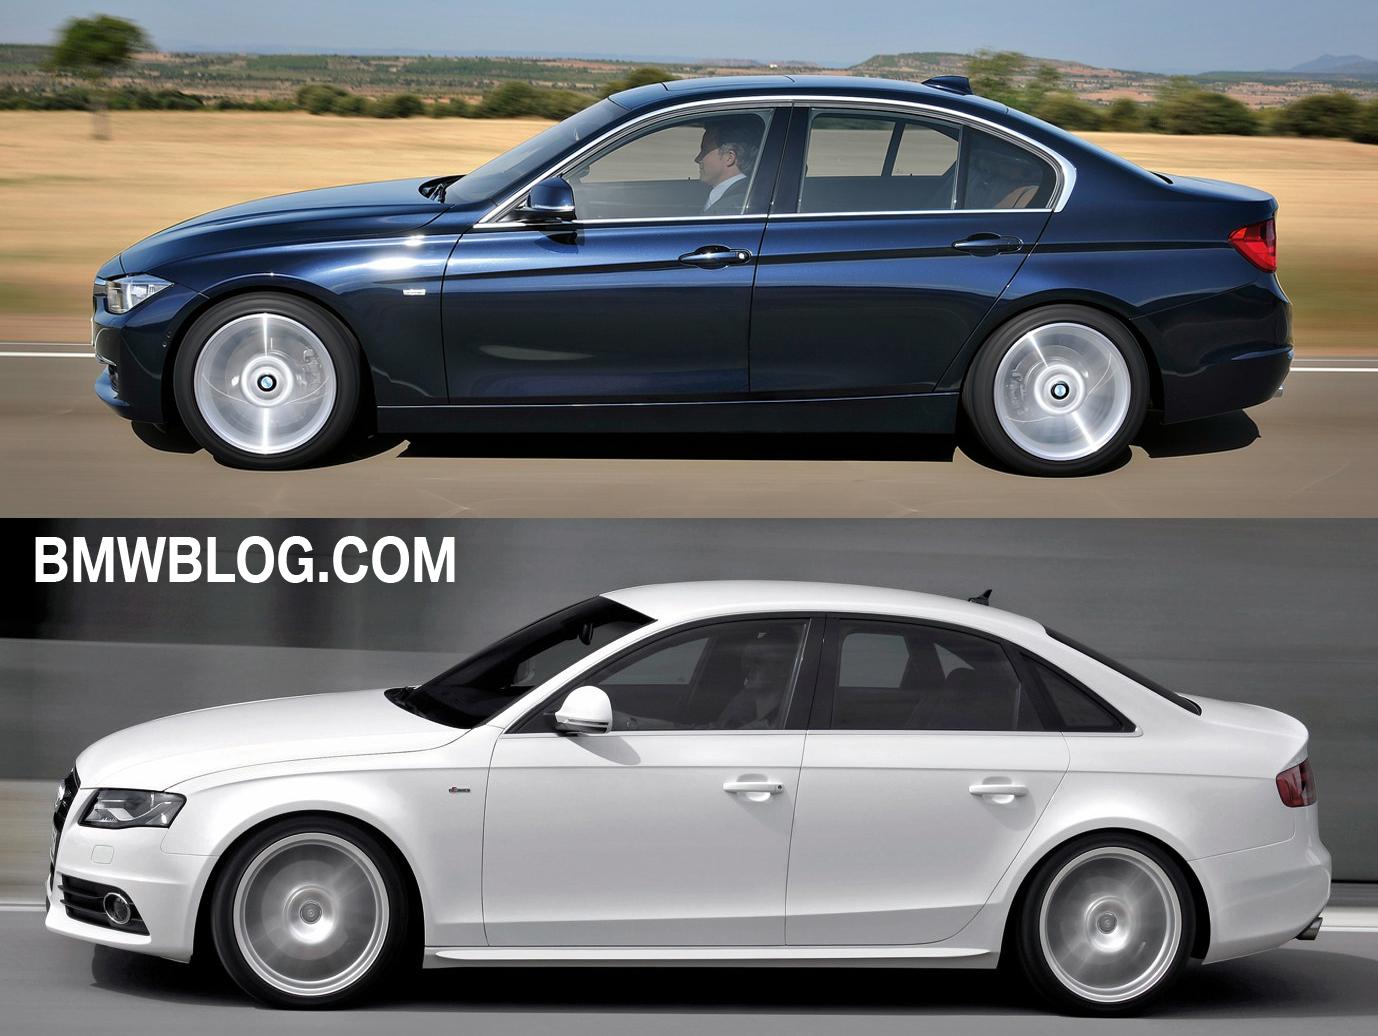 Photo Comparison Audi A4 Vs 2012 Bmw 3 Series